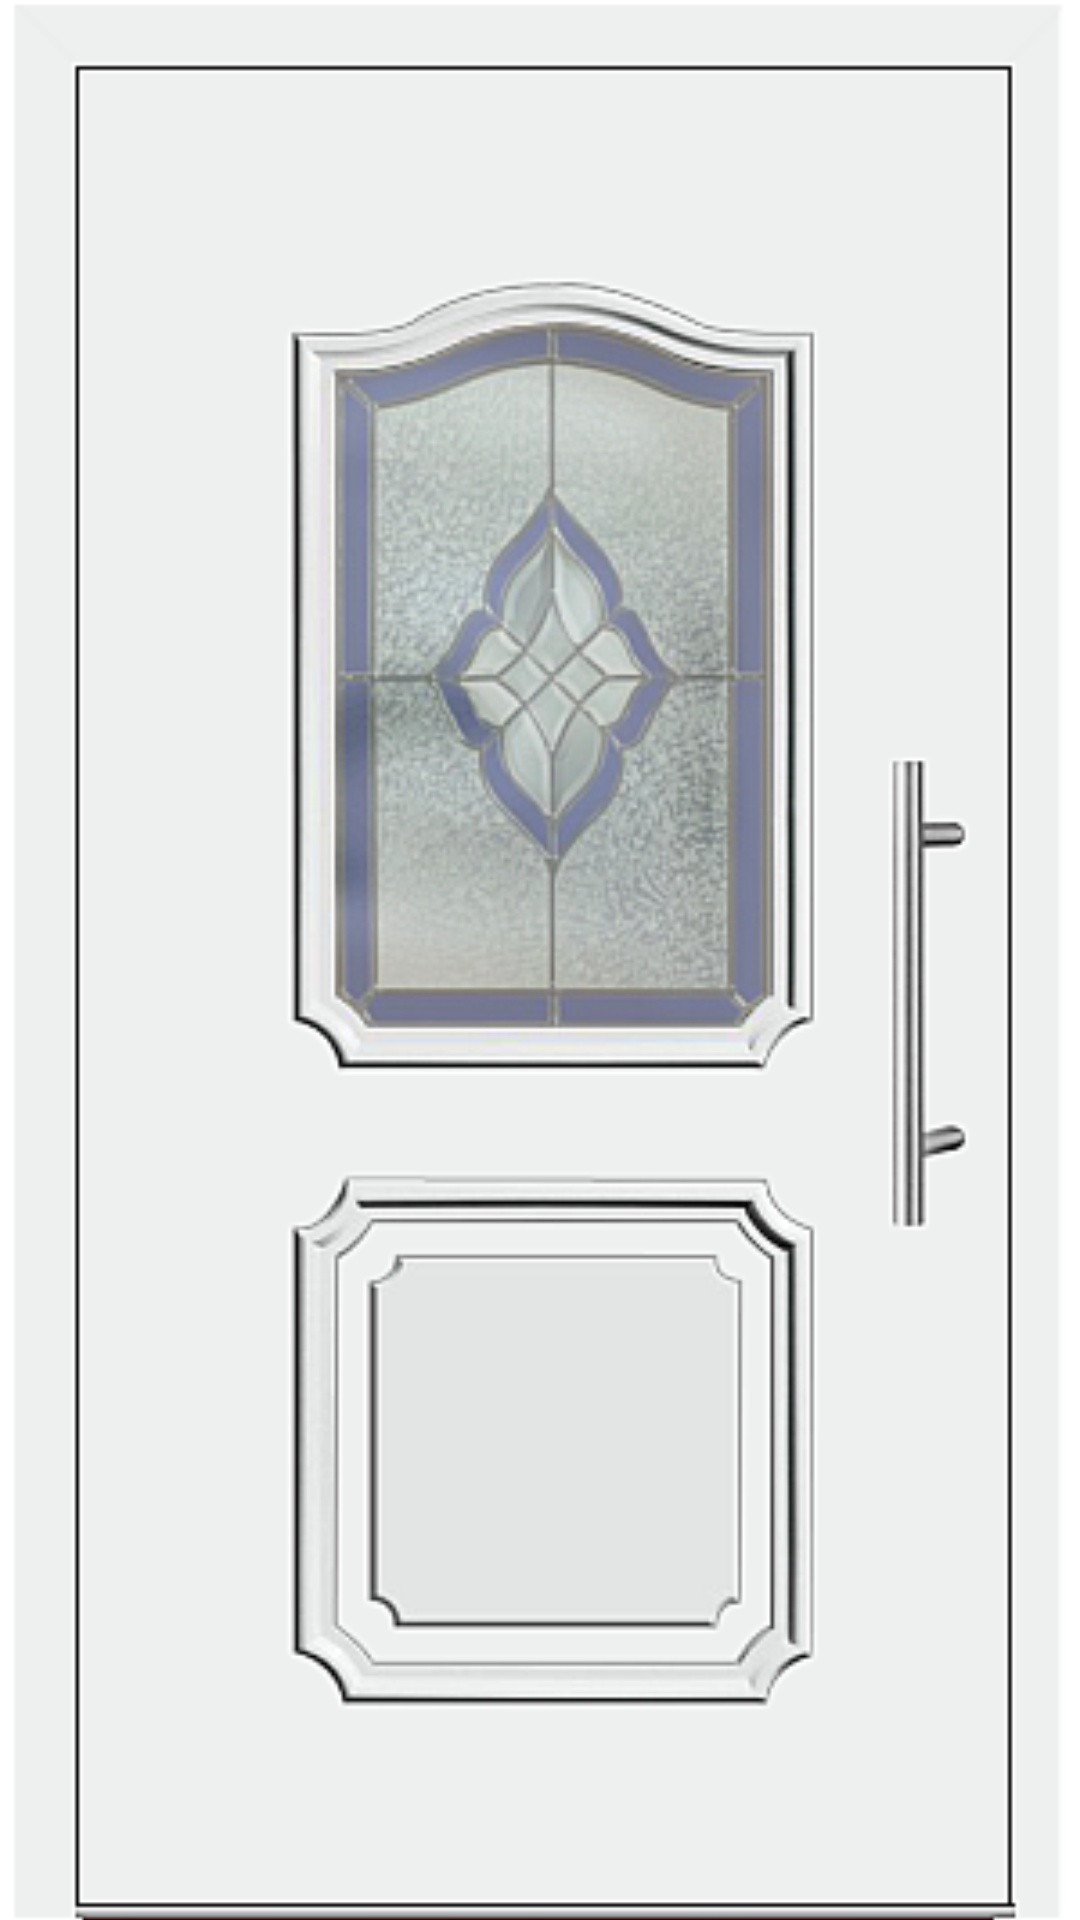 Aluminium Haustür Modell 202-10 weiß